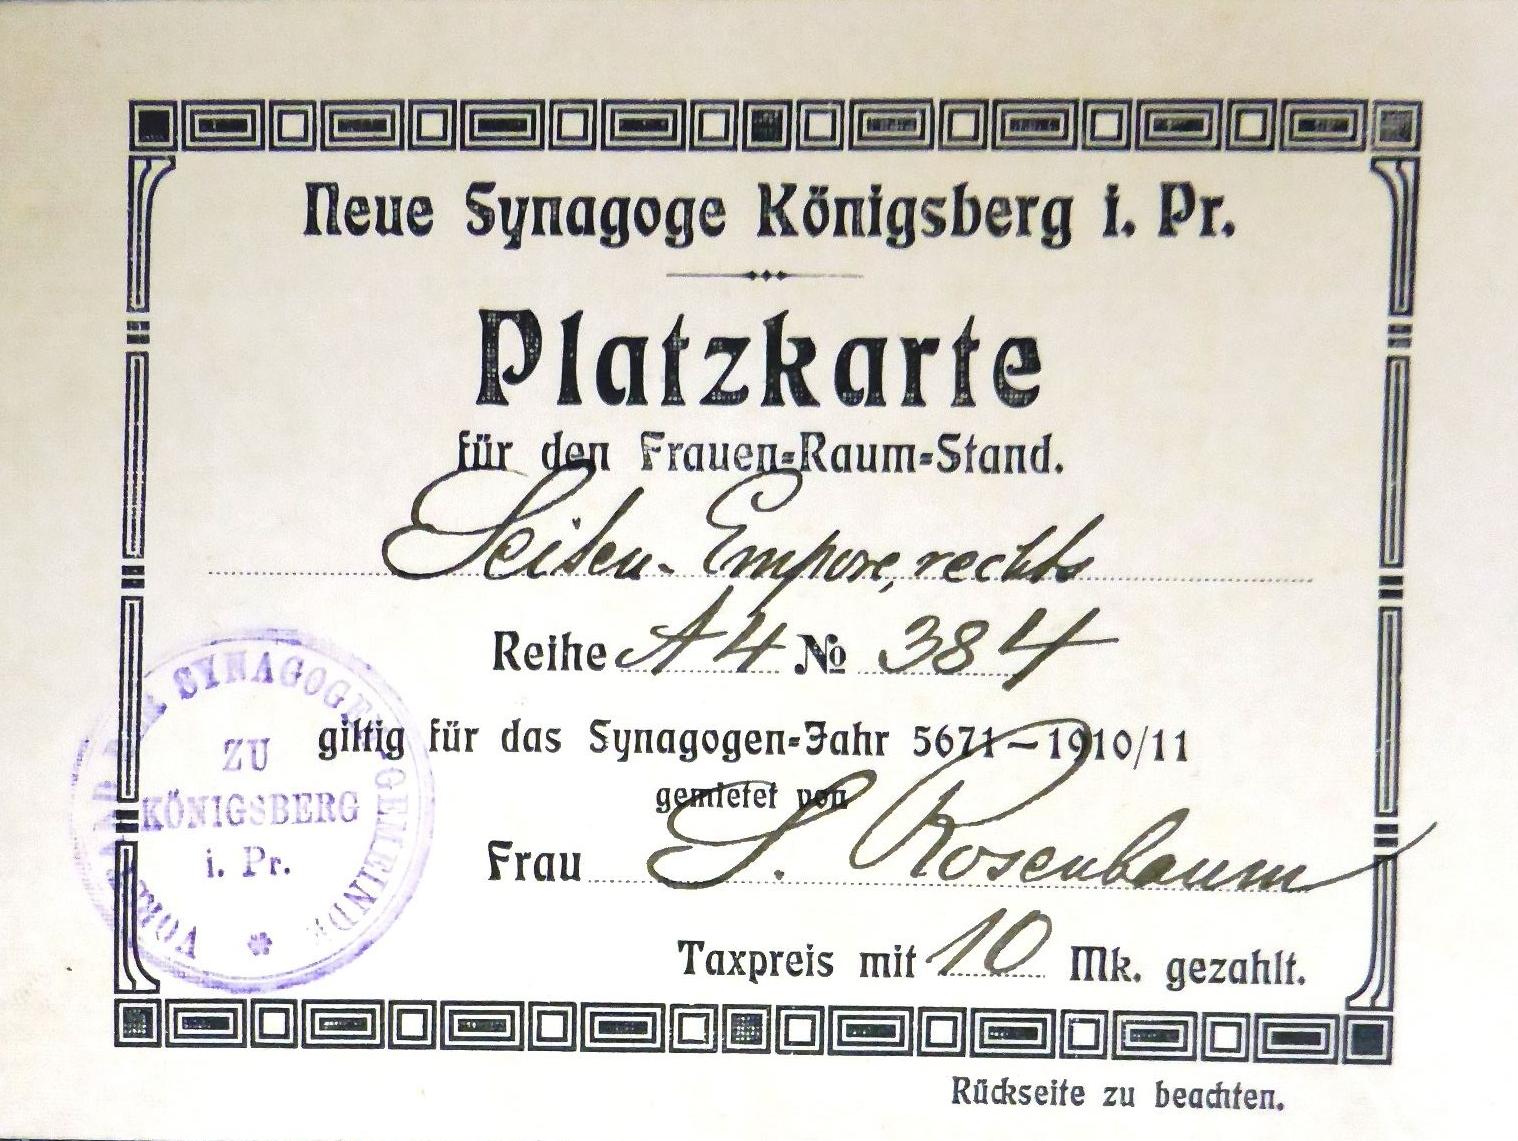 Paltzkare Königsberg 1910